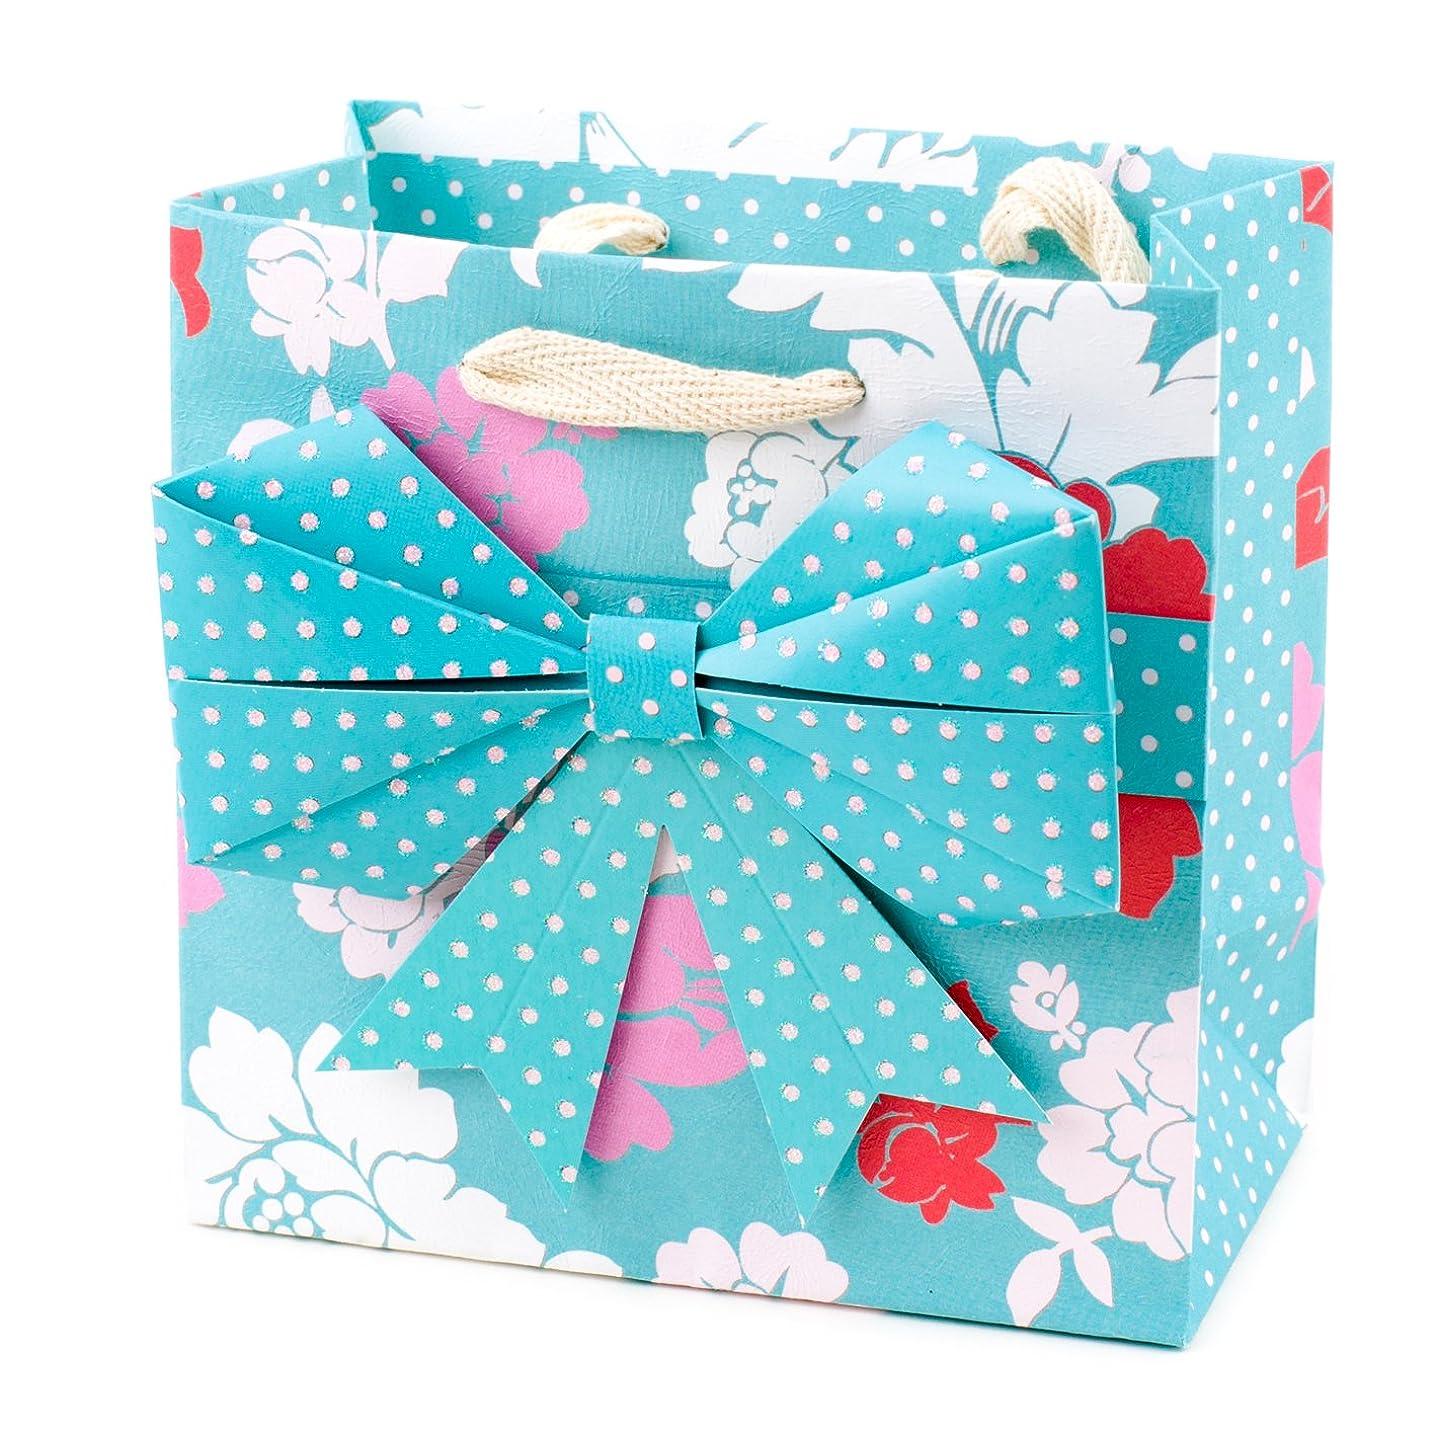 Hallmark Signature Small Gift Bag (Origami Bow)